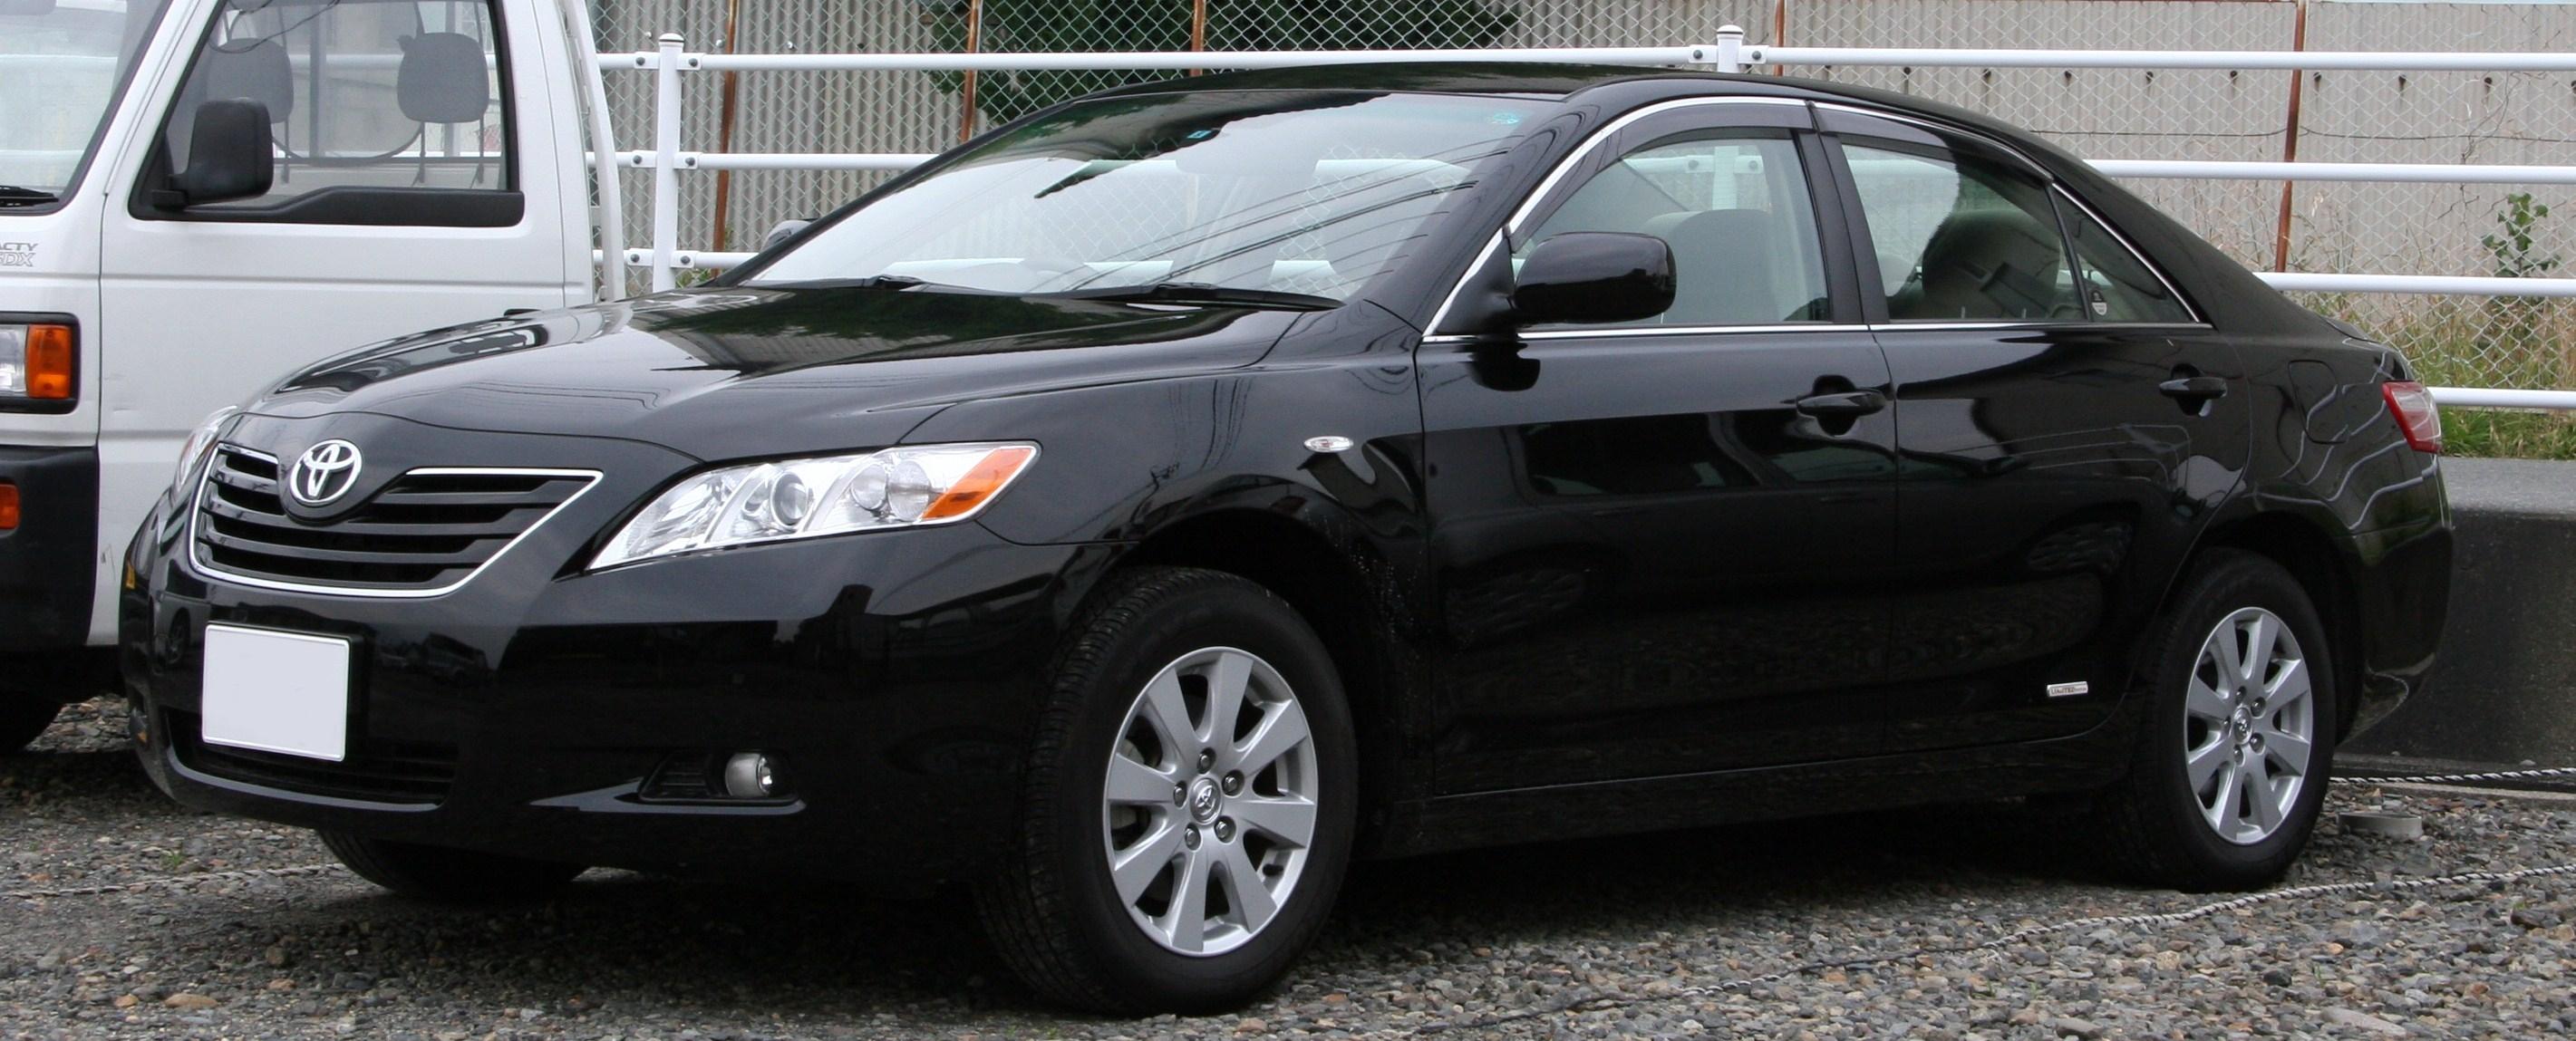 2009 Toyota Camry Image 21